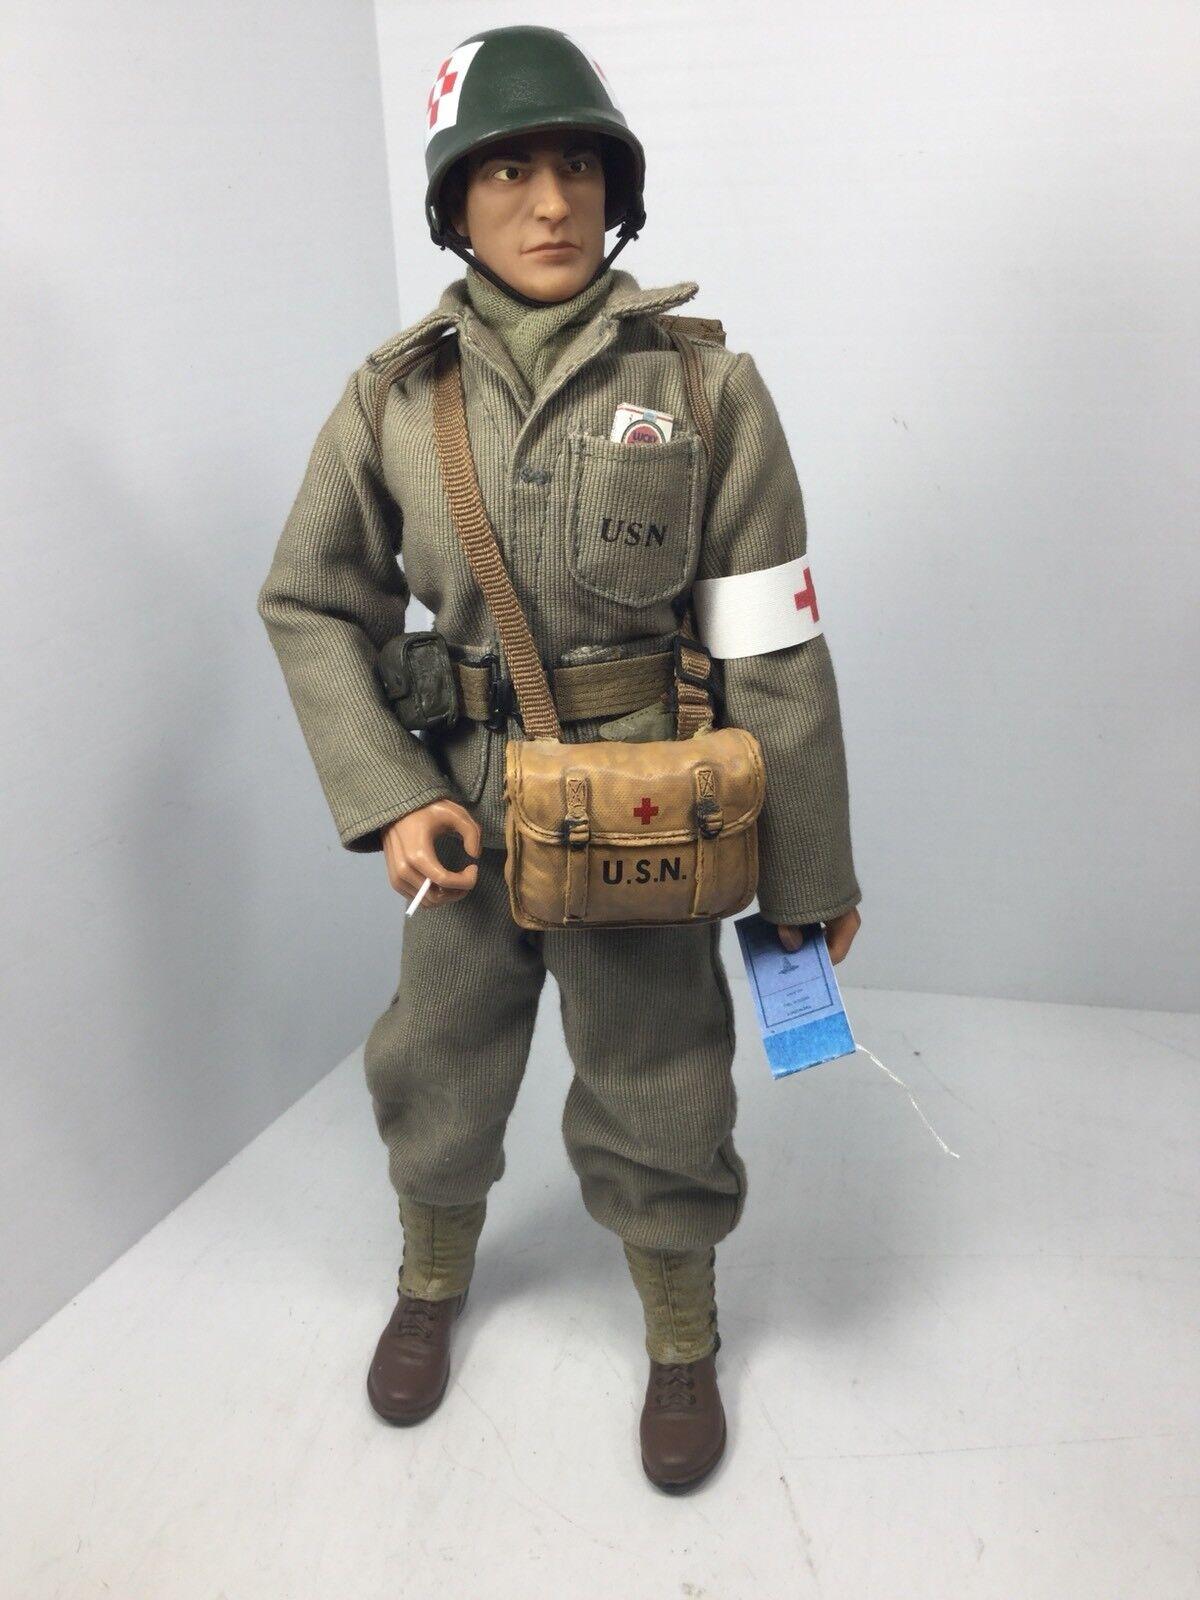 1 6 21ST Century Us Navy enfermero Medic USMC Jugara de aterrizaje DRAGON DID Segunda Guerra Mundial Bbi